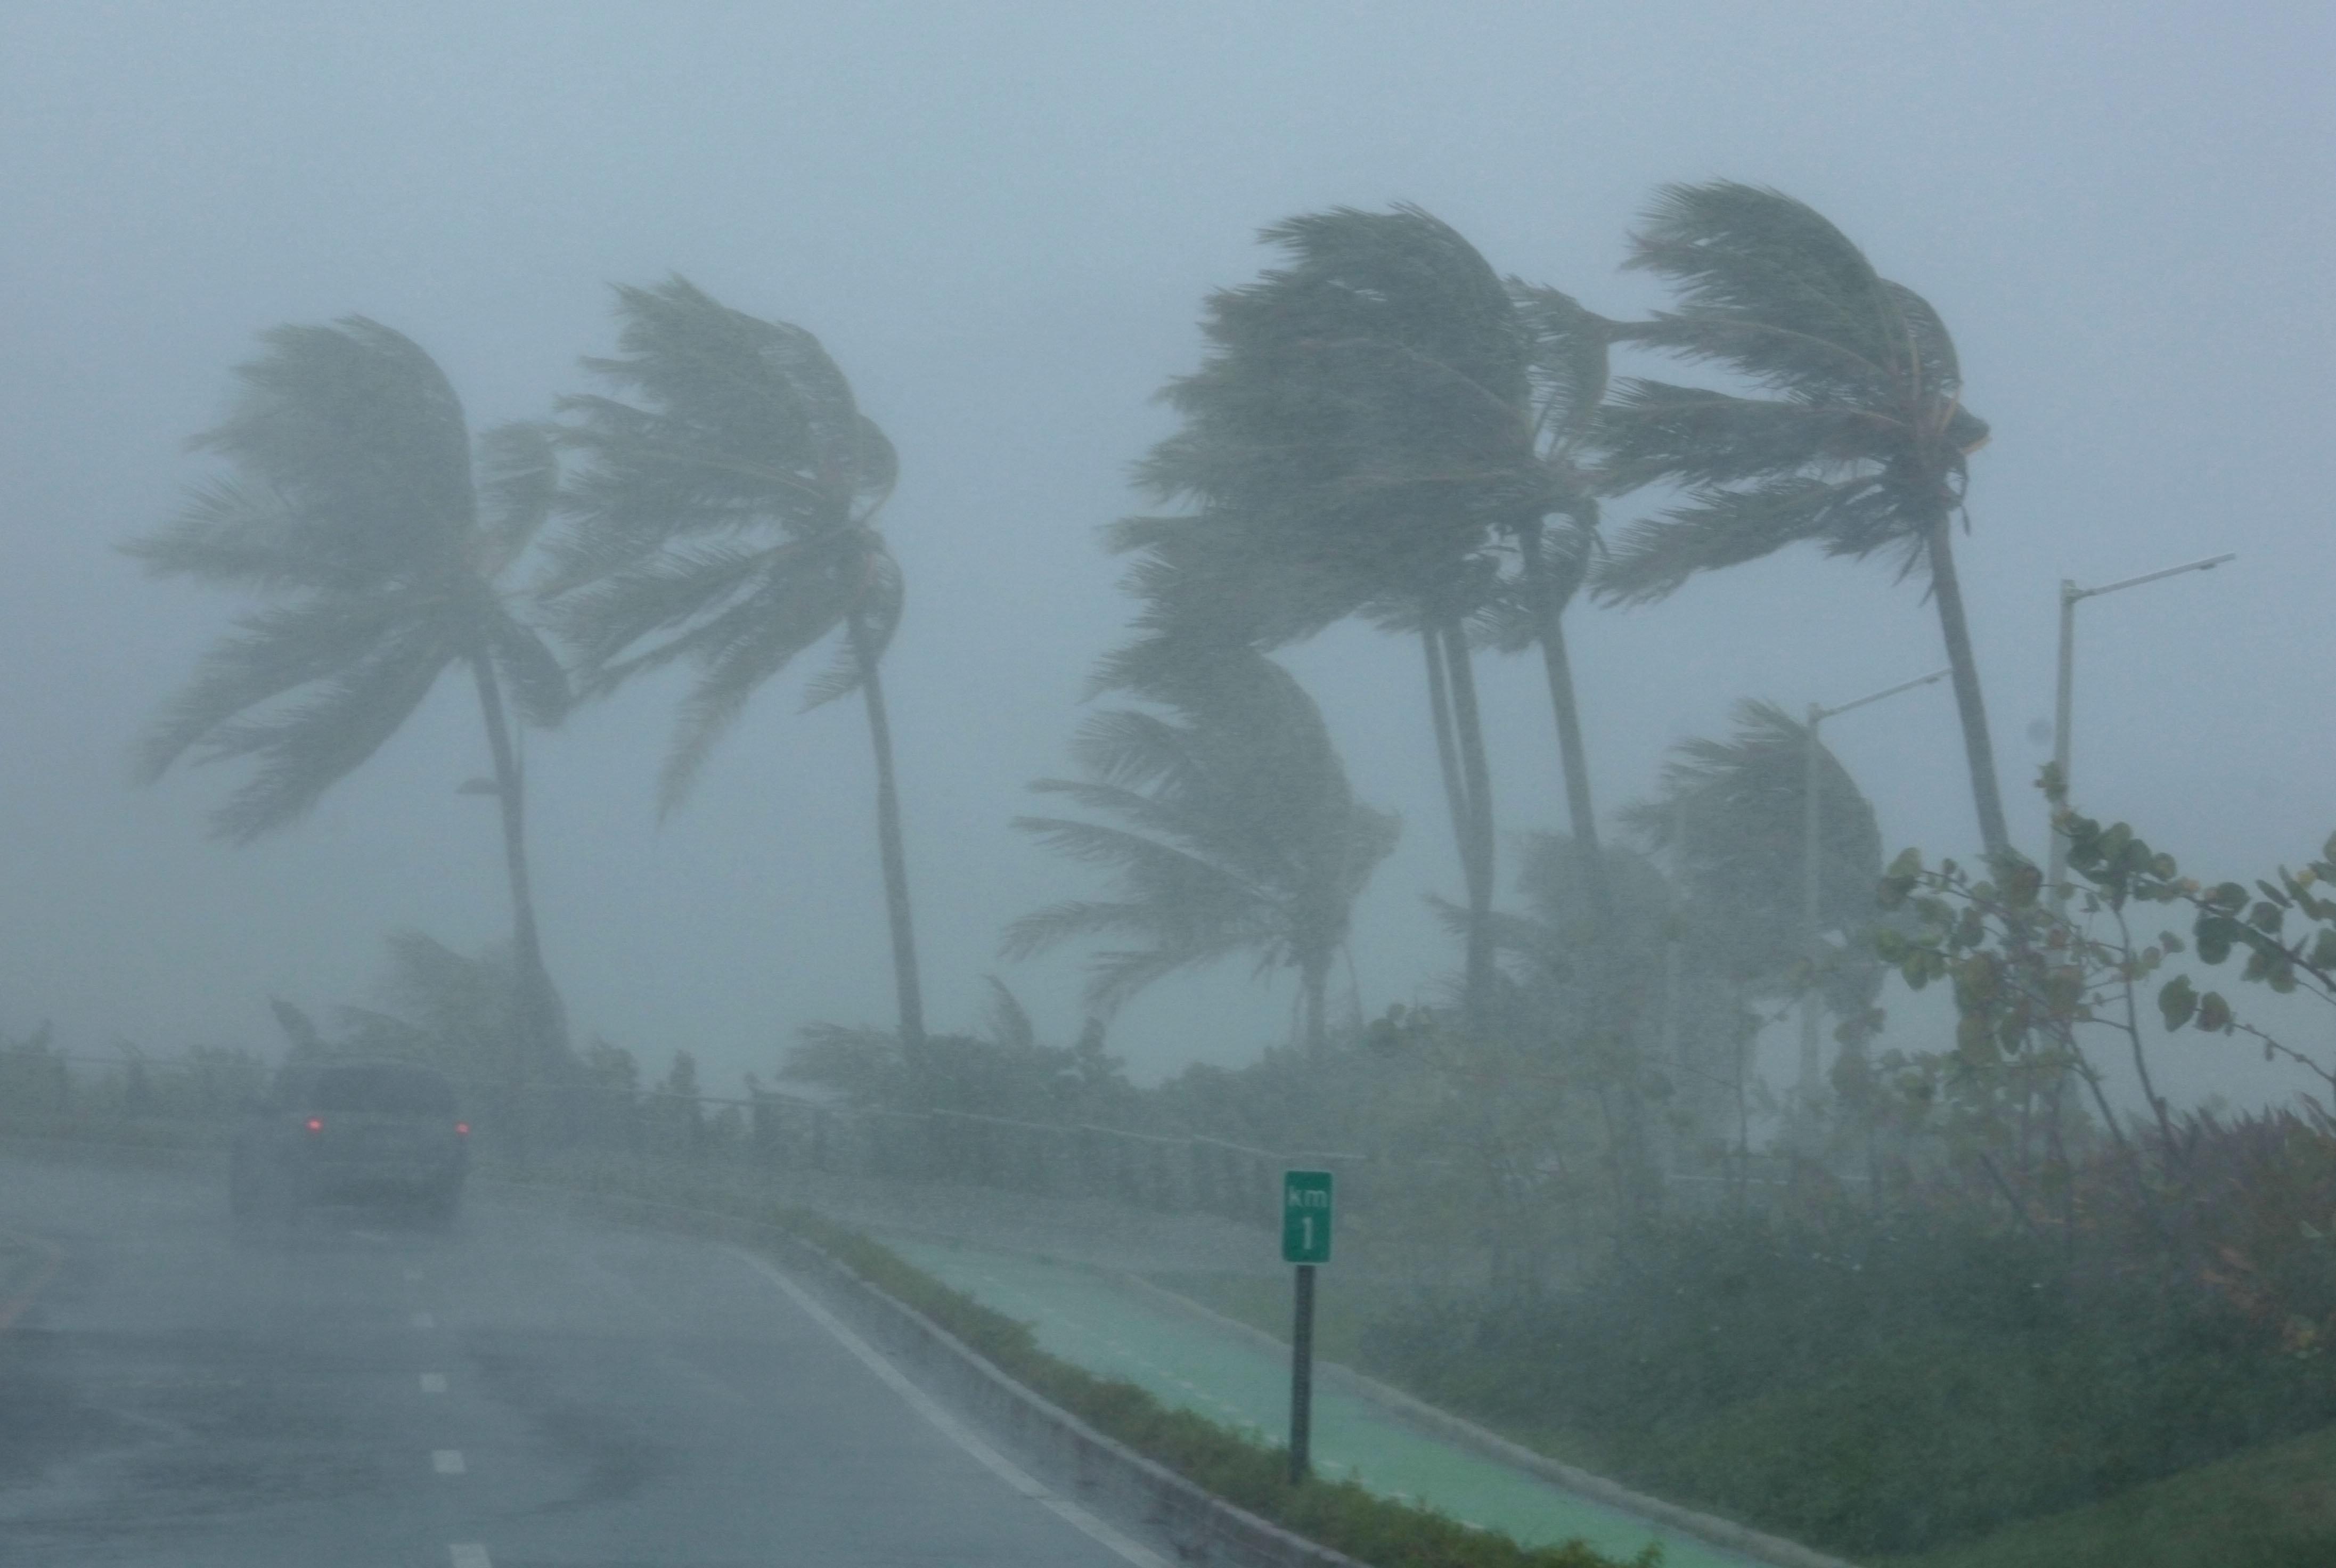 These Photos Show Hurricane Irma's Destructive Path Across The